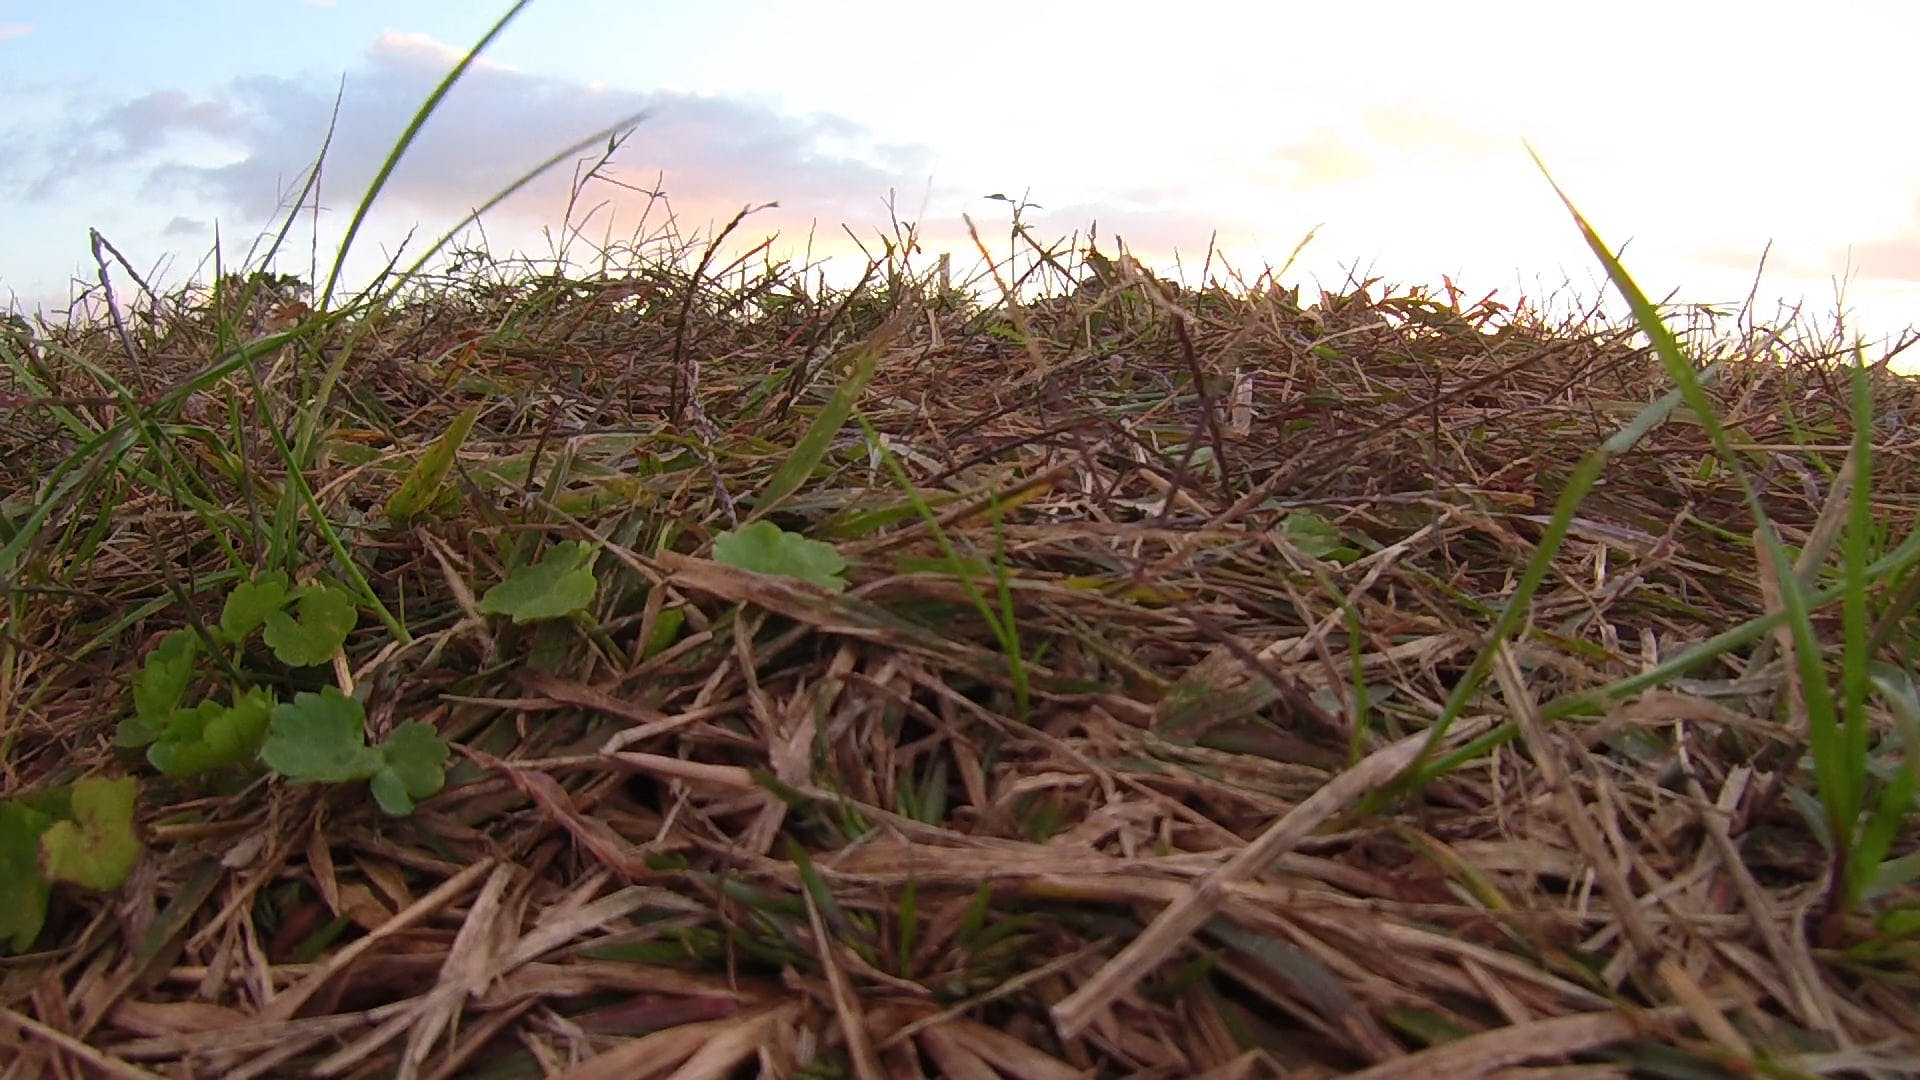 Footage Of A Vast Farmland